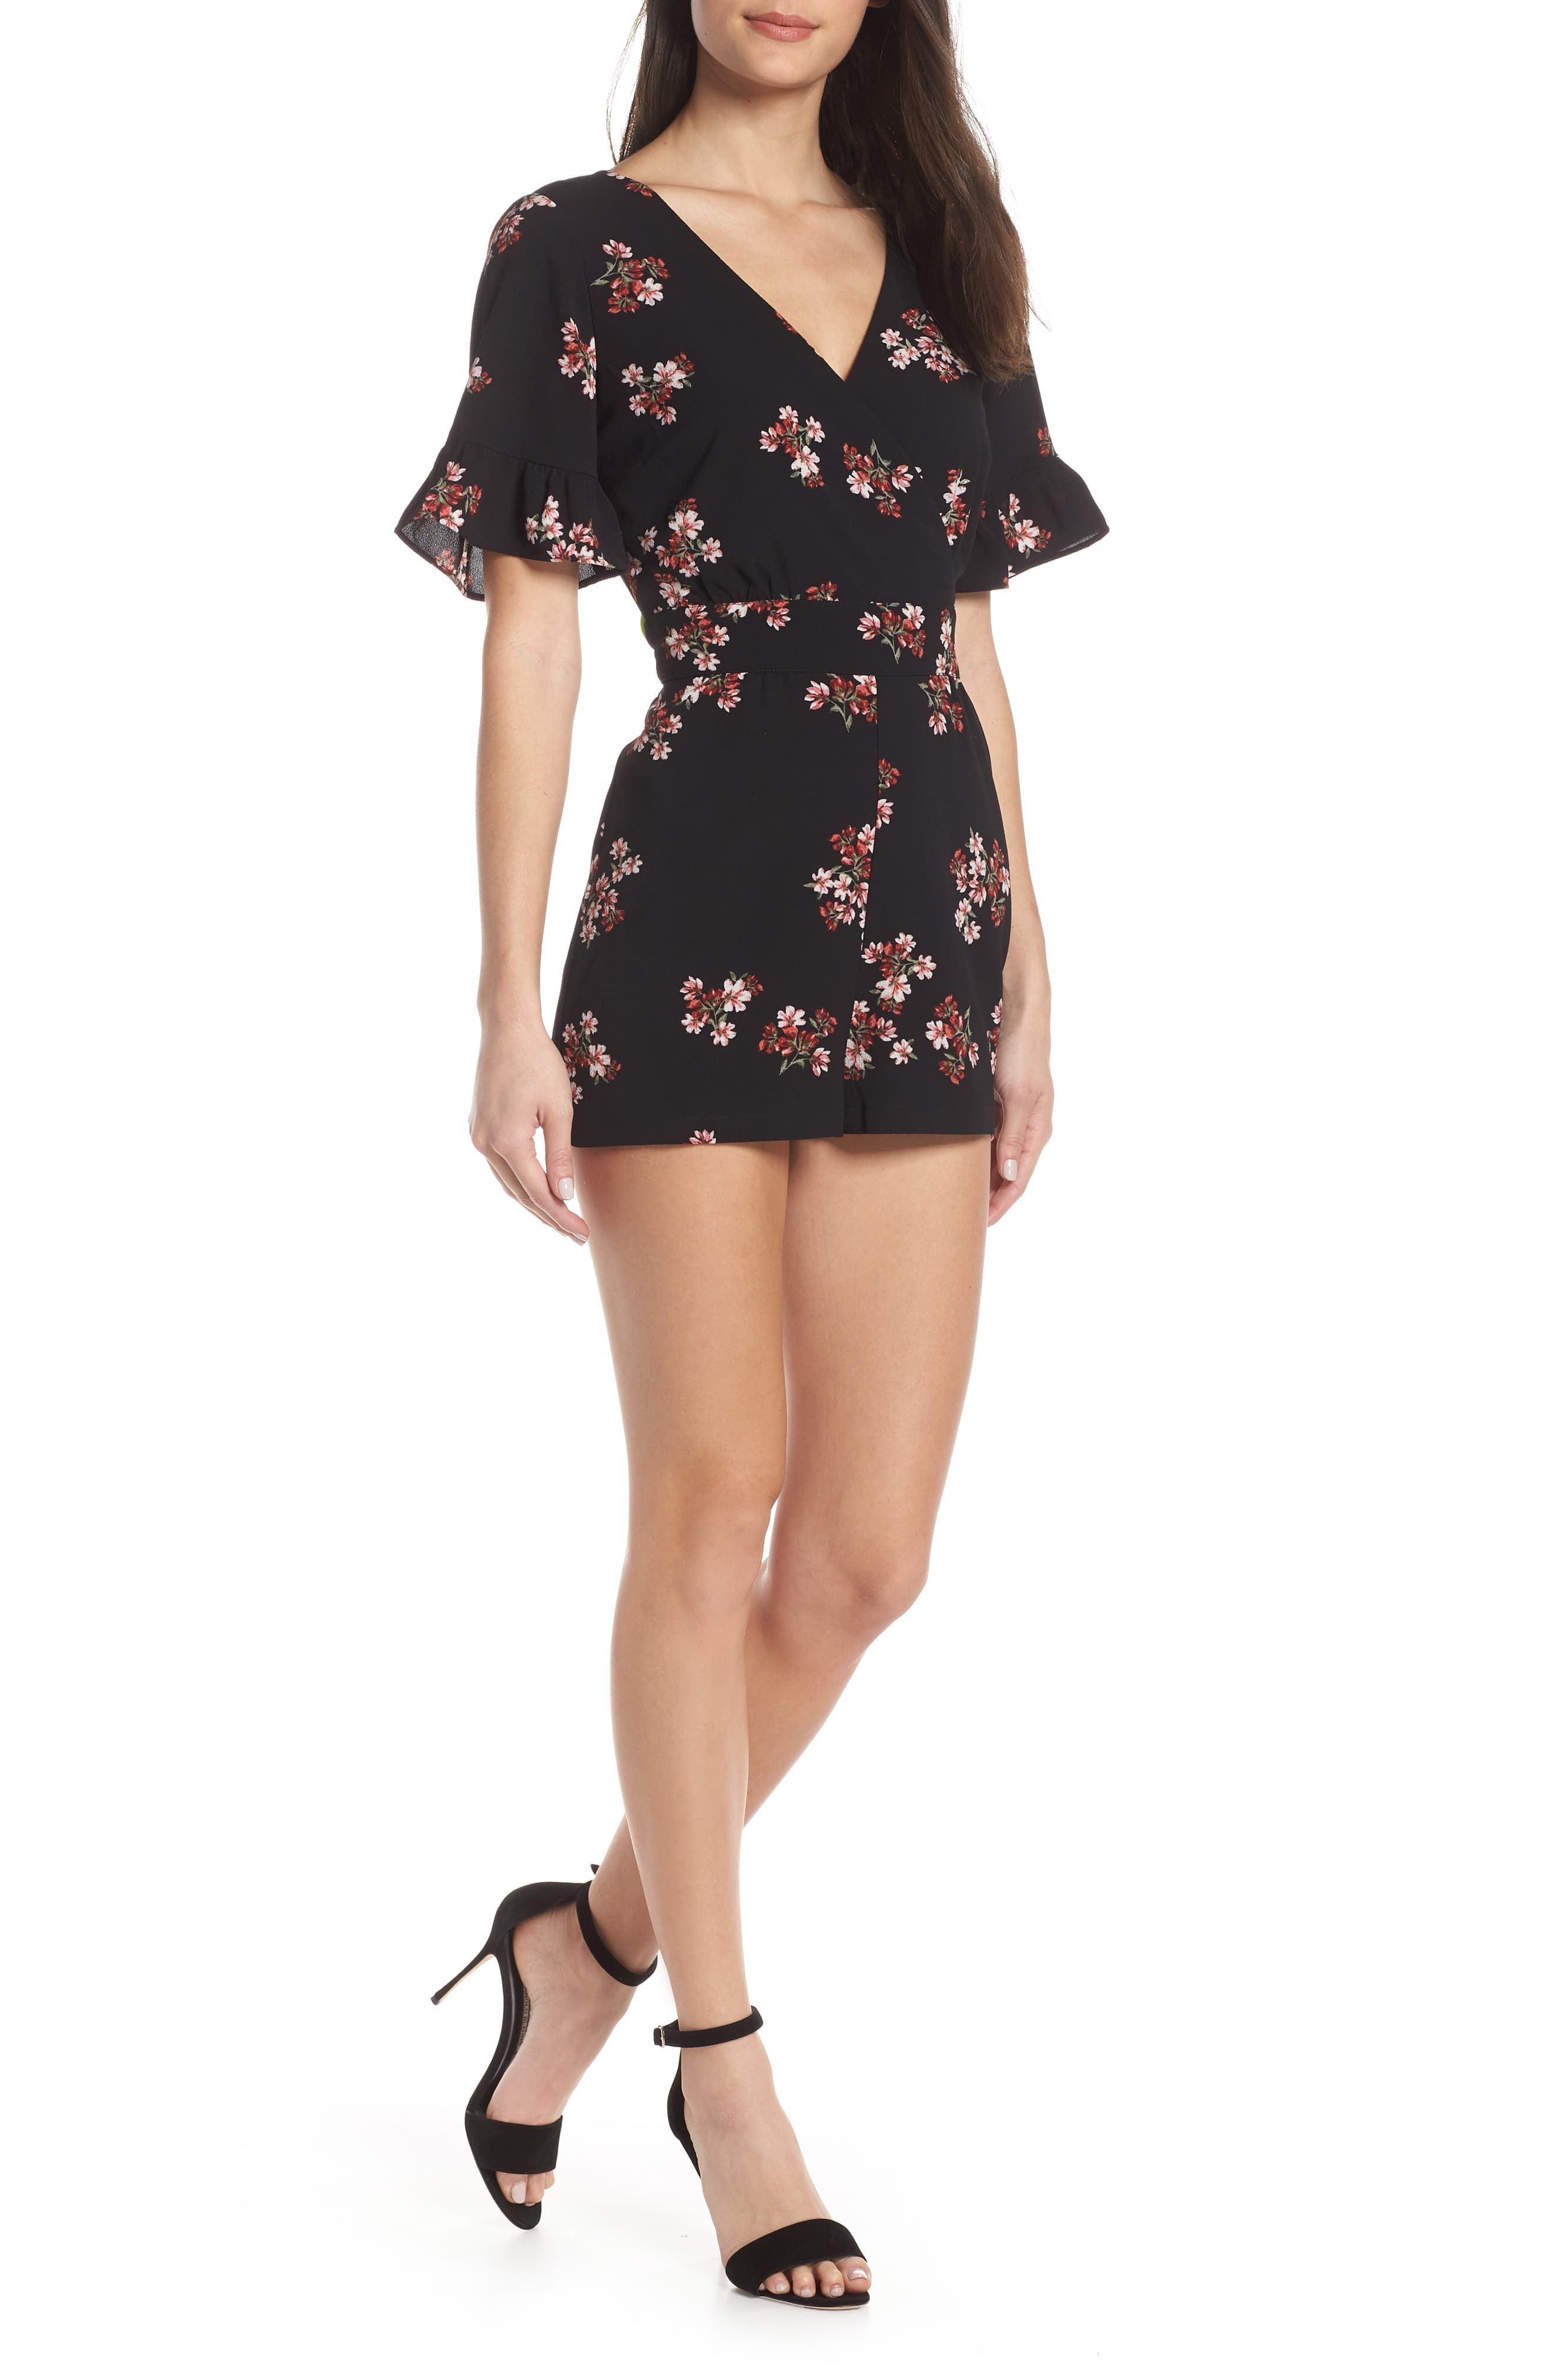 Bb Dakota Floral Orchard Romper Rompers Best Wedding Guest Dresses Clothes For Women